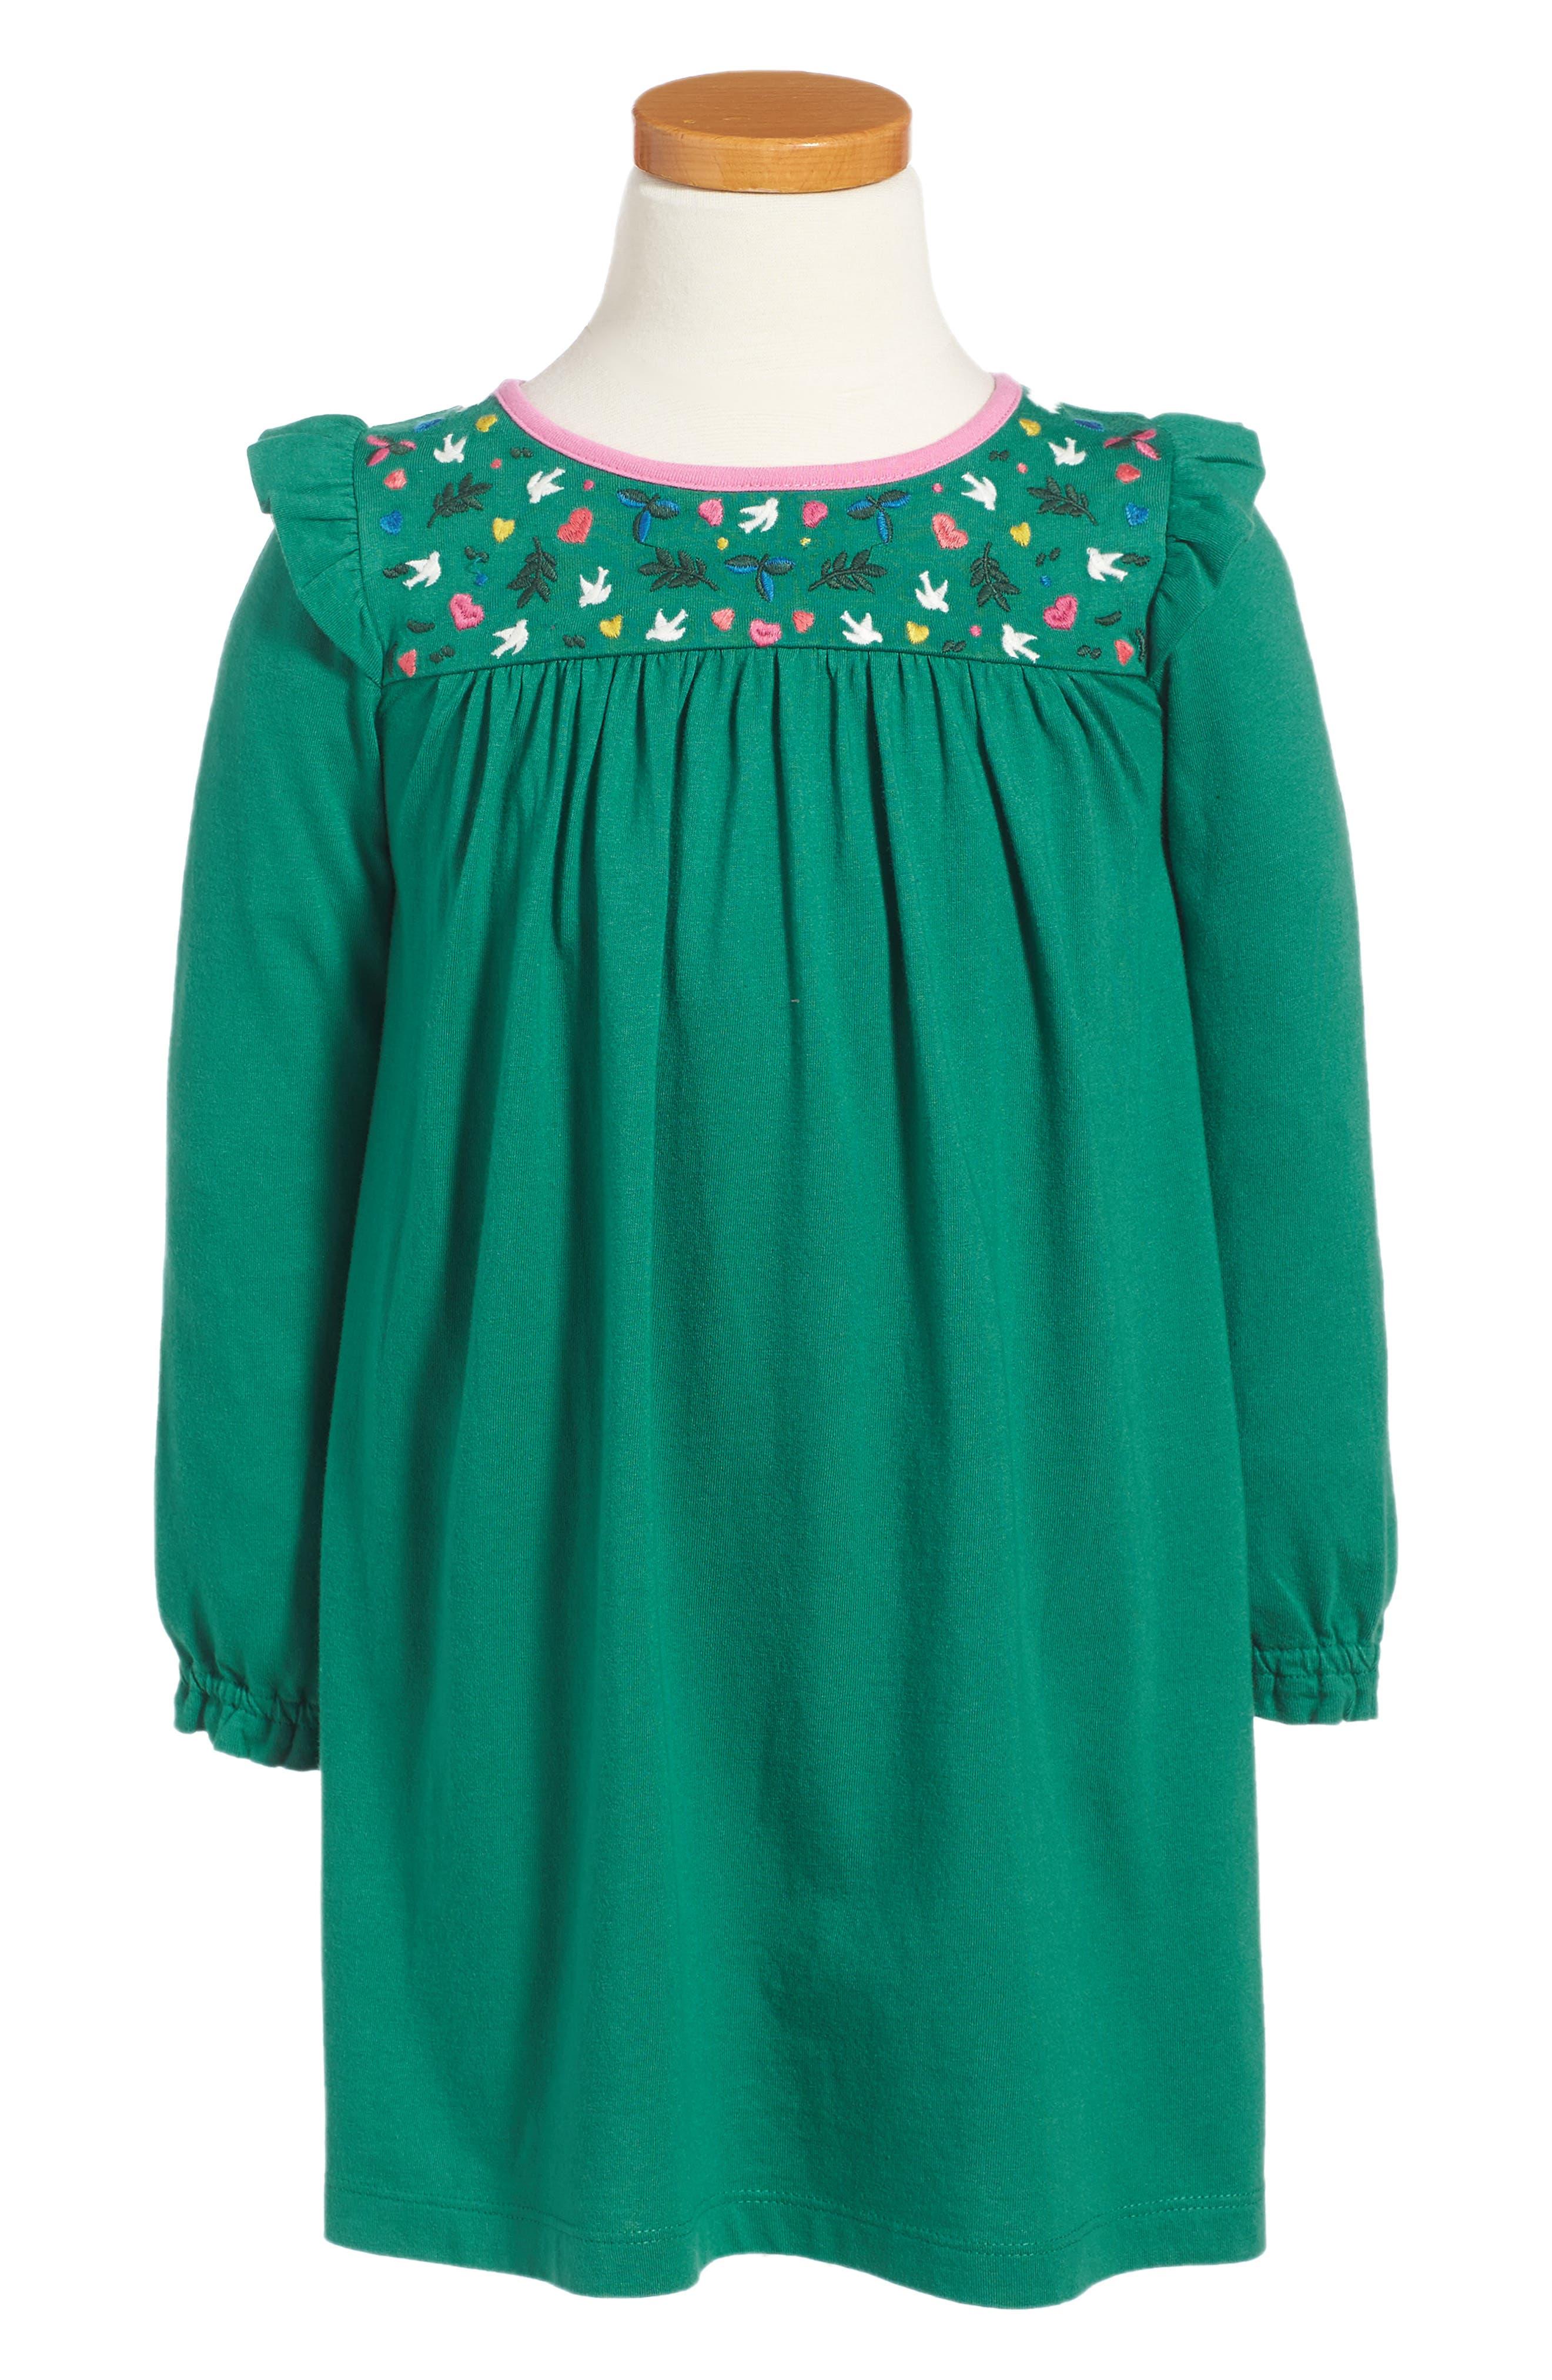 Frill Jersey Dress,                             Main thumbnail 1, color,                             315